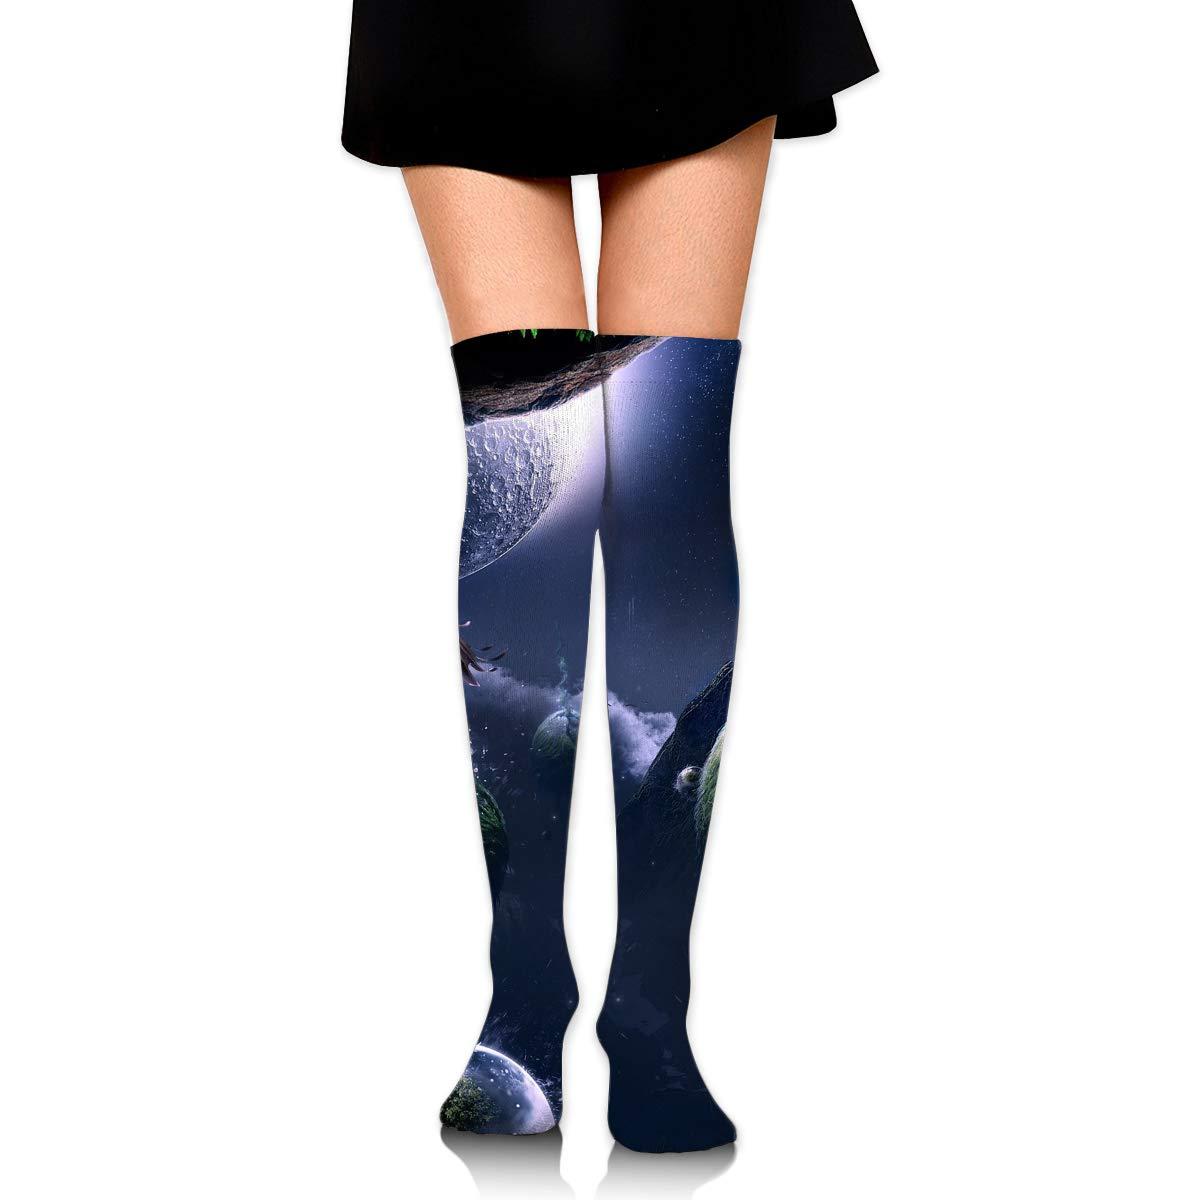 High Elasticity Girl Cotton Knee High Socks Uniform Fantasy Eagle Earth Women Tube Socks